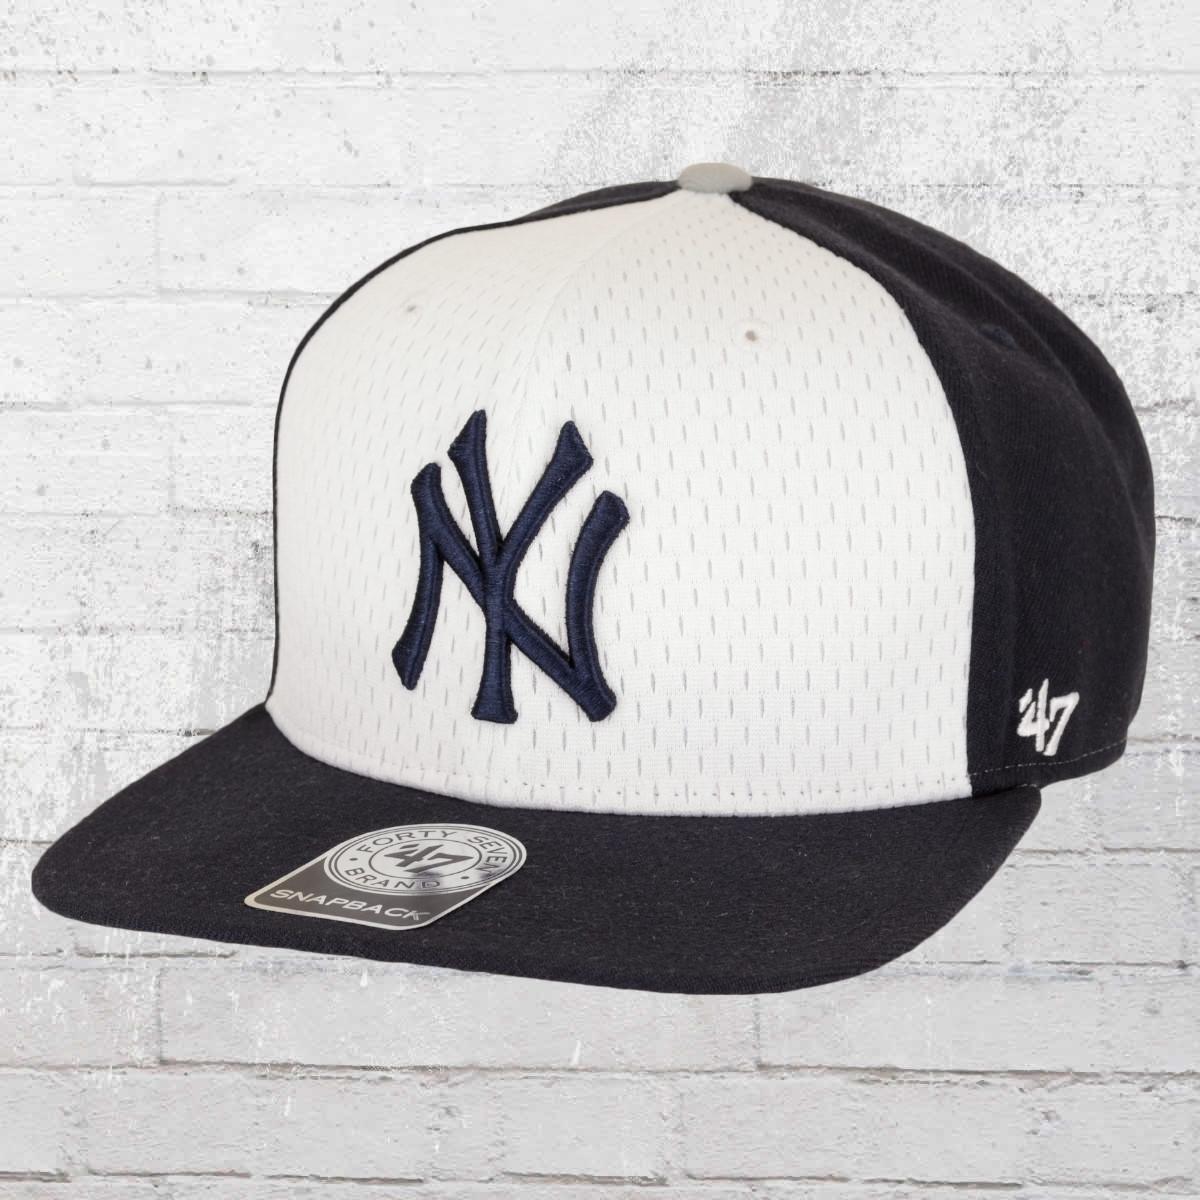 d018db6a617 47 Brand MLB New York Yankees Snapback Baseball Hat navy white